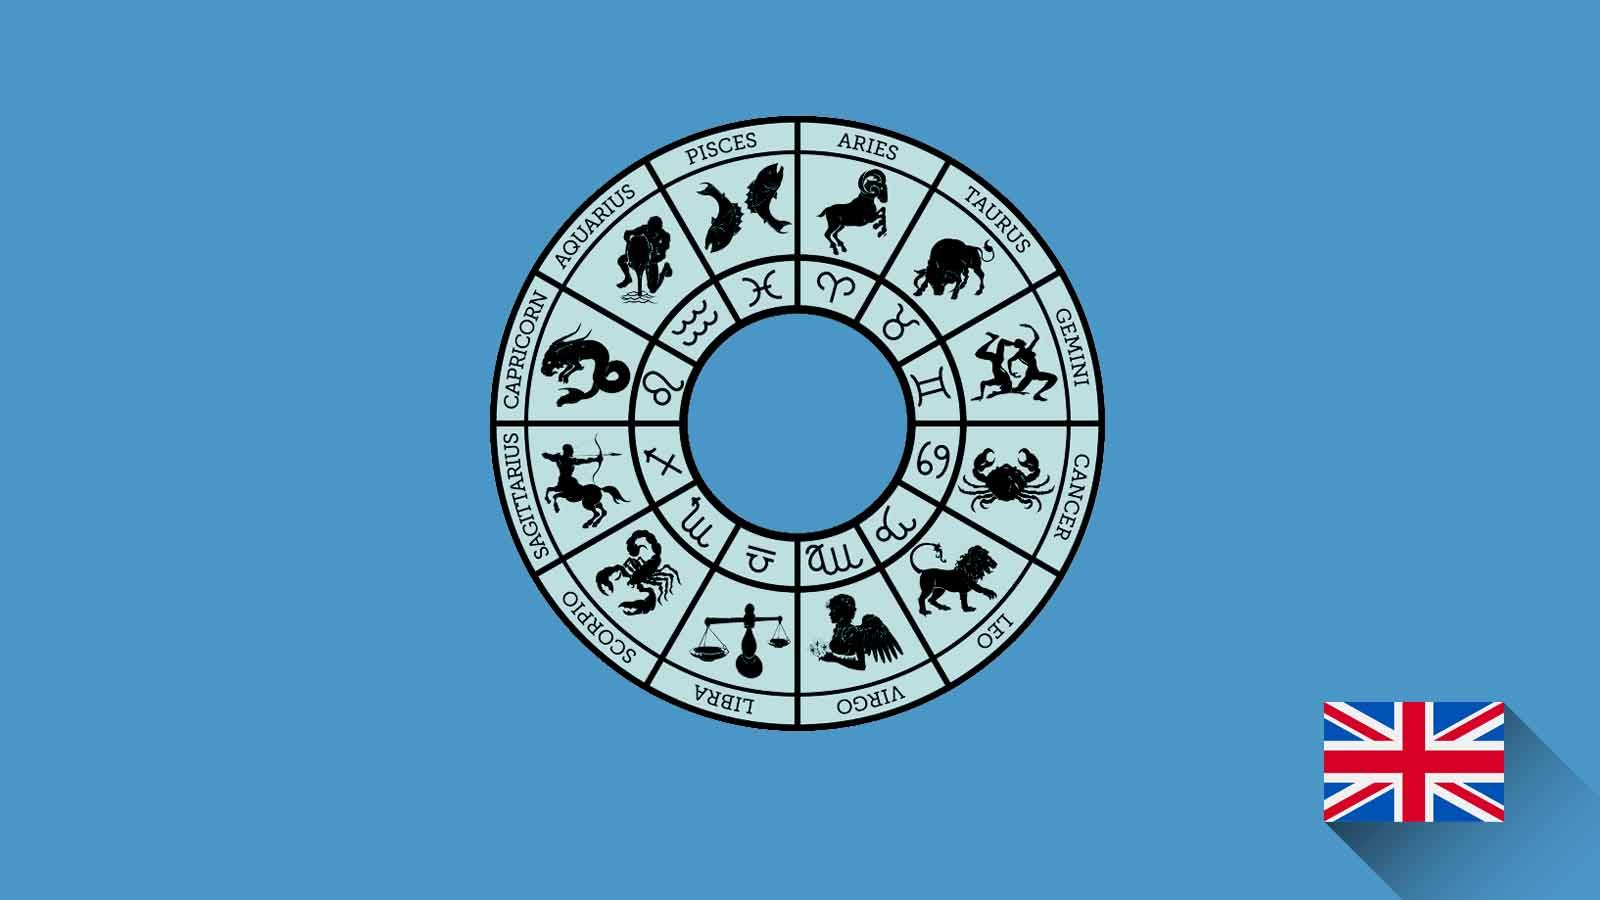 Kosakata Bahasa Inggris Zodiak Disertai Gambar, Audio Dan Pronunciation